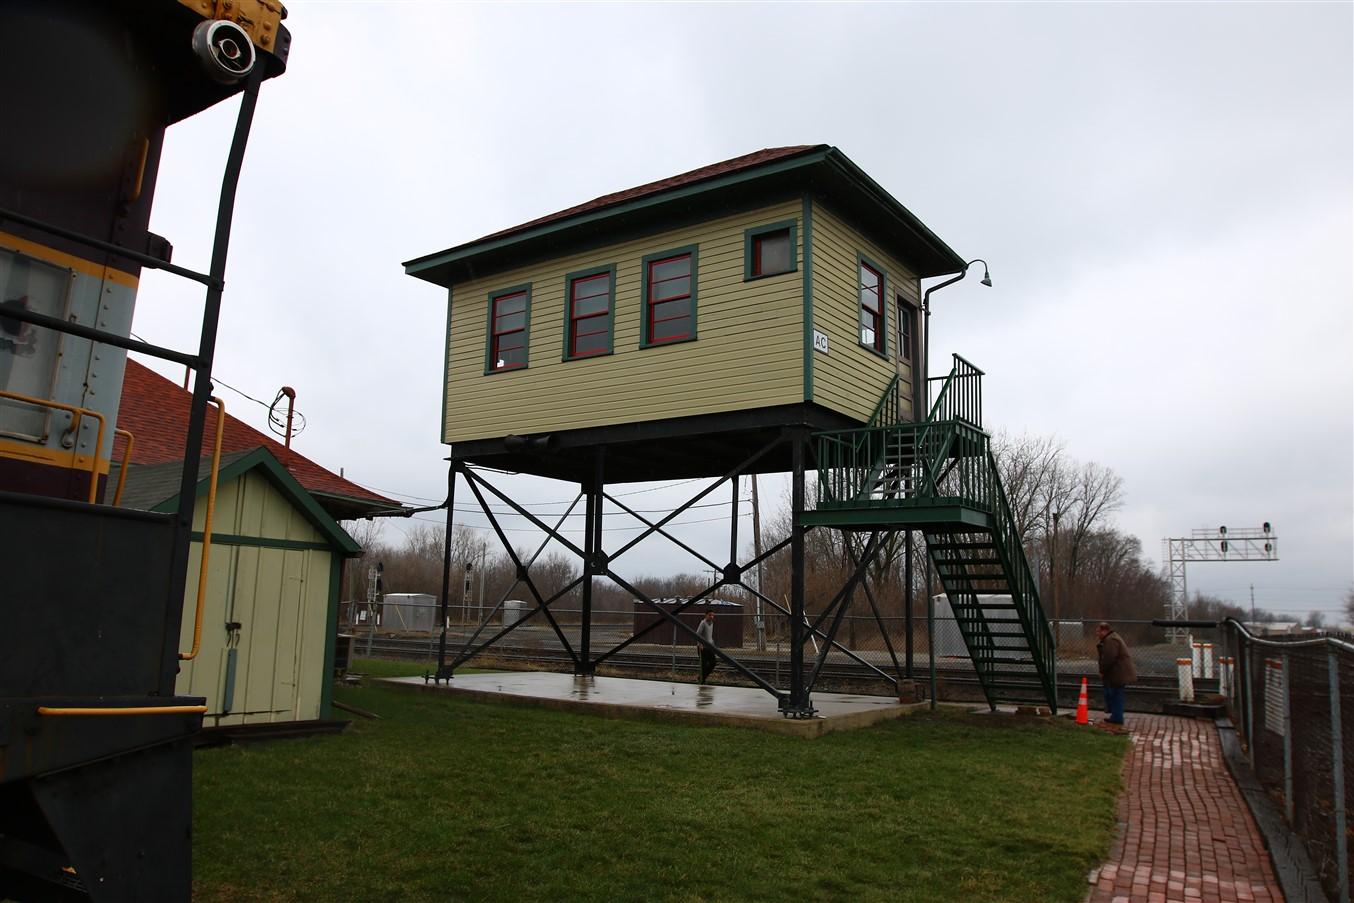 2017 03 18 310 Marion OH Railroad Club Depot.jpg